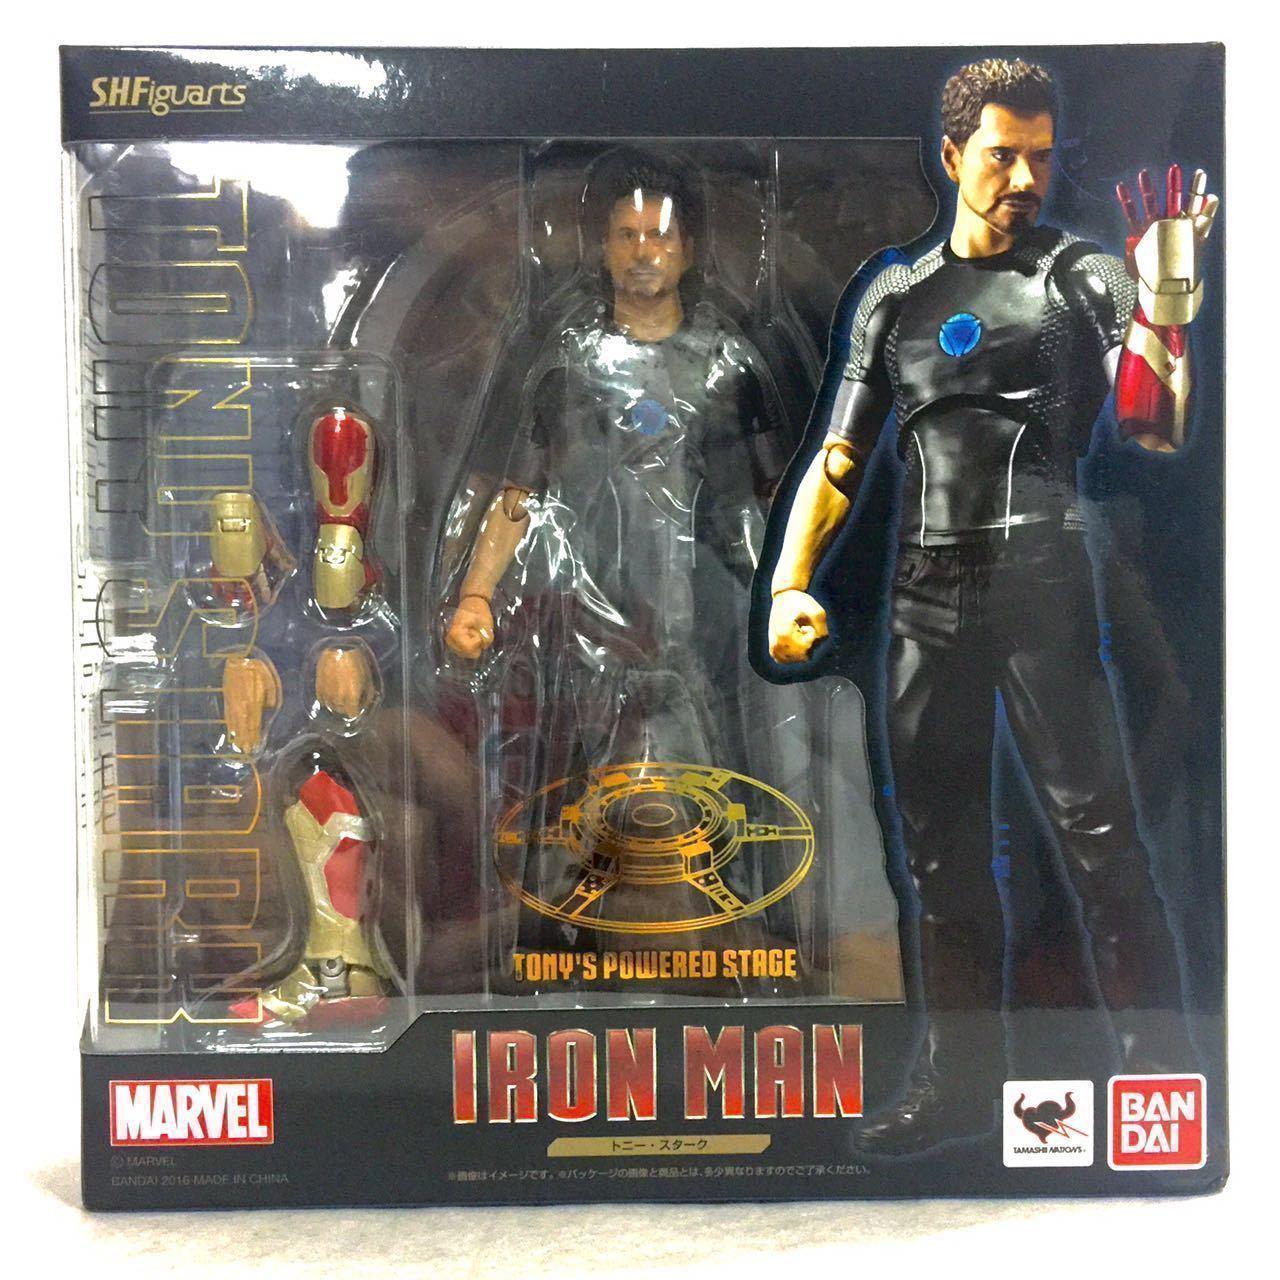 S.H.Figuarts Marvel IRON MAN 3 TONY STARK Action Figure Mk42 TONYS POWERED STAGE Anime Figure Collectible Model Toy